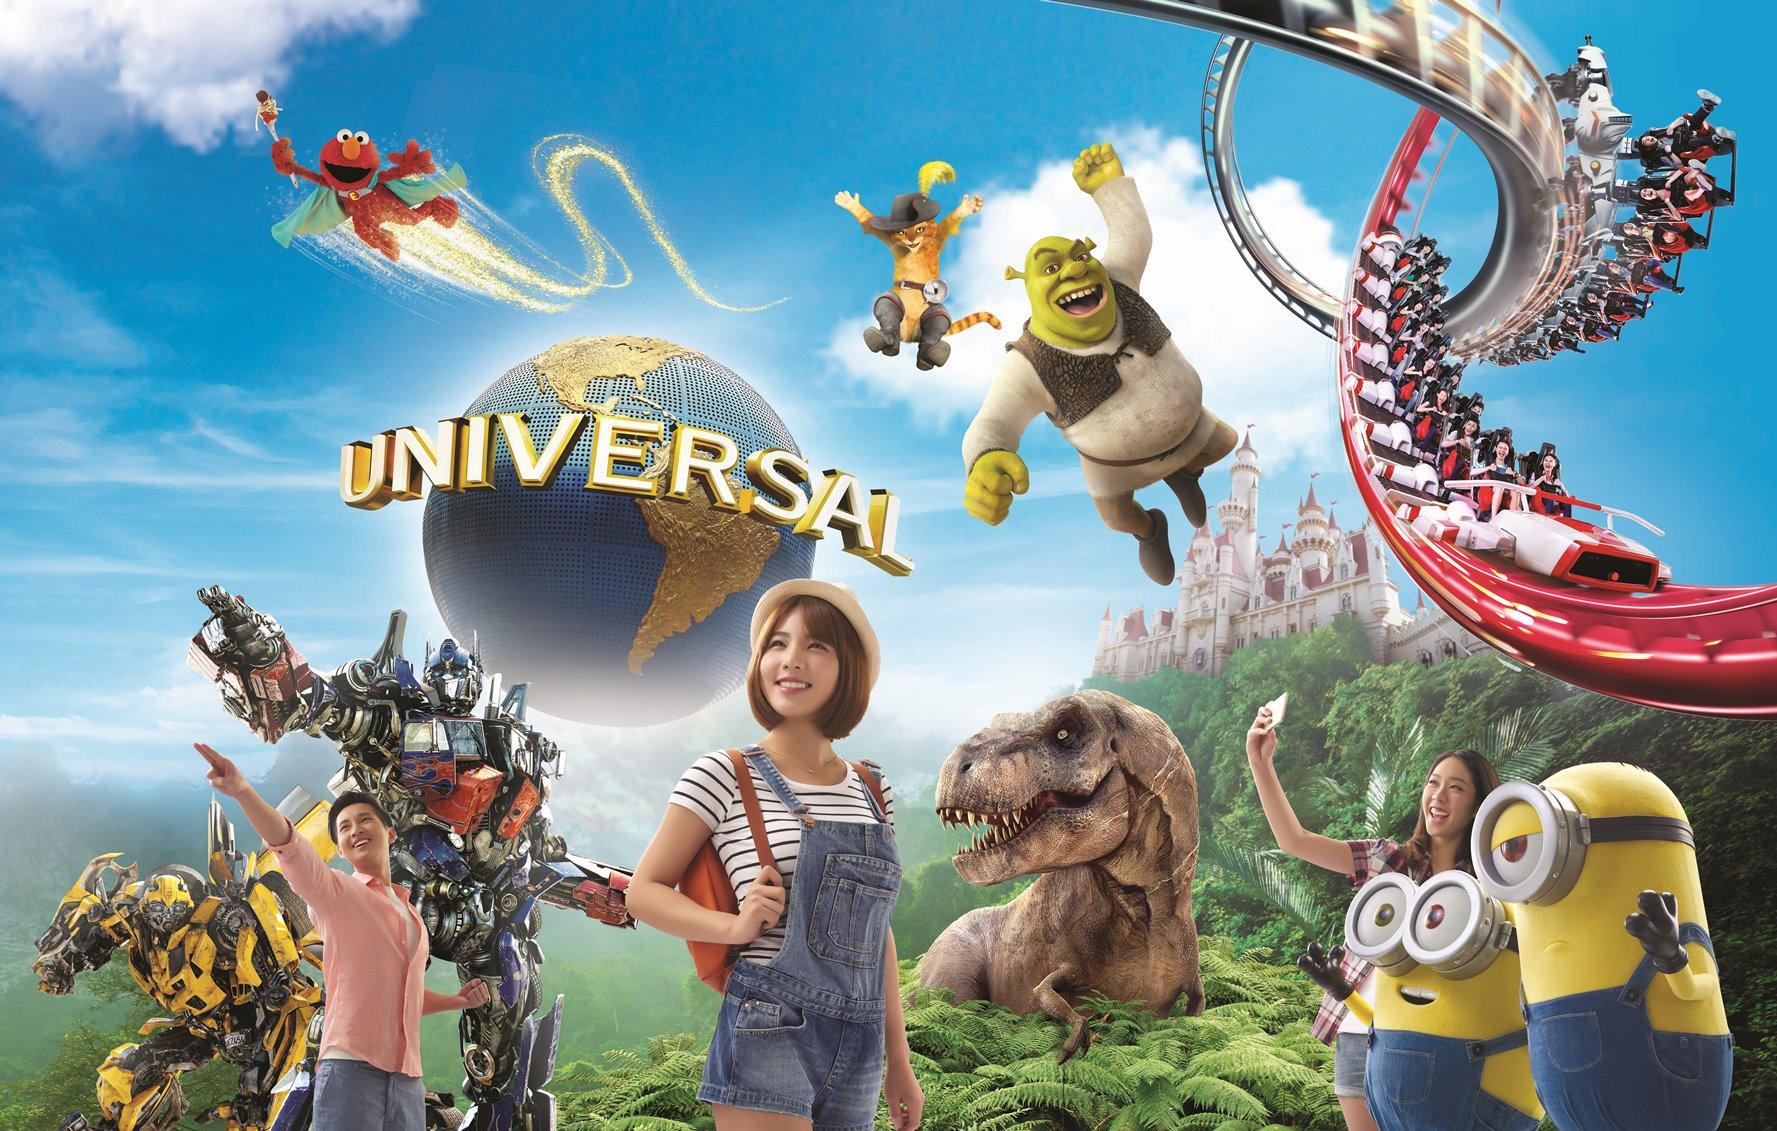 【Fun ‧ 紛樂園】必遊!新加坡環球影城™│新加坡自由行套票3-31天